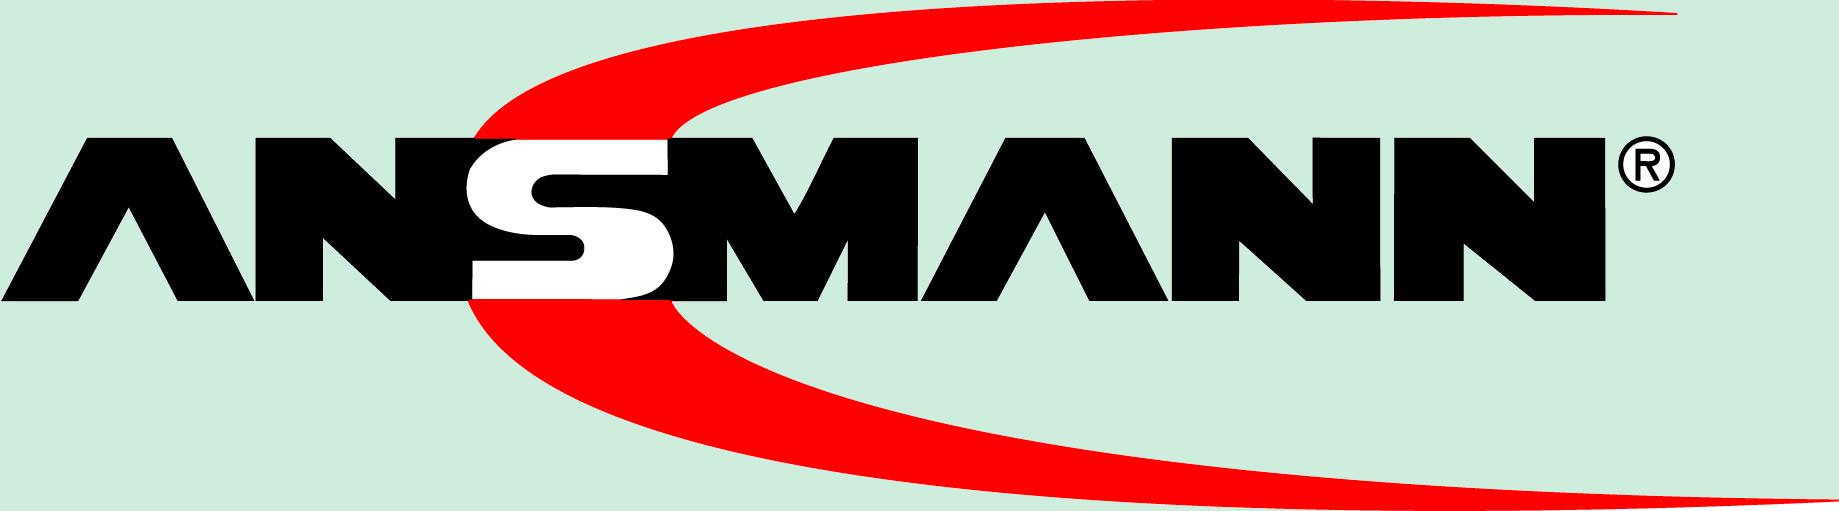 Ansmann-Pile